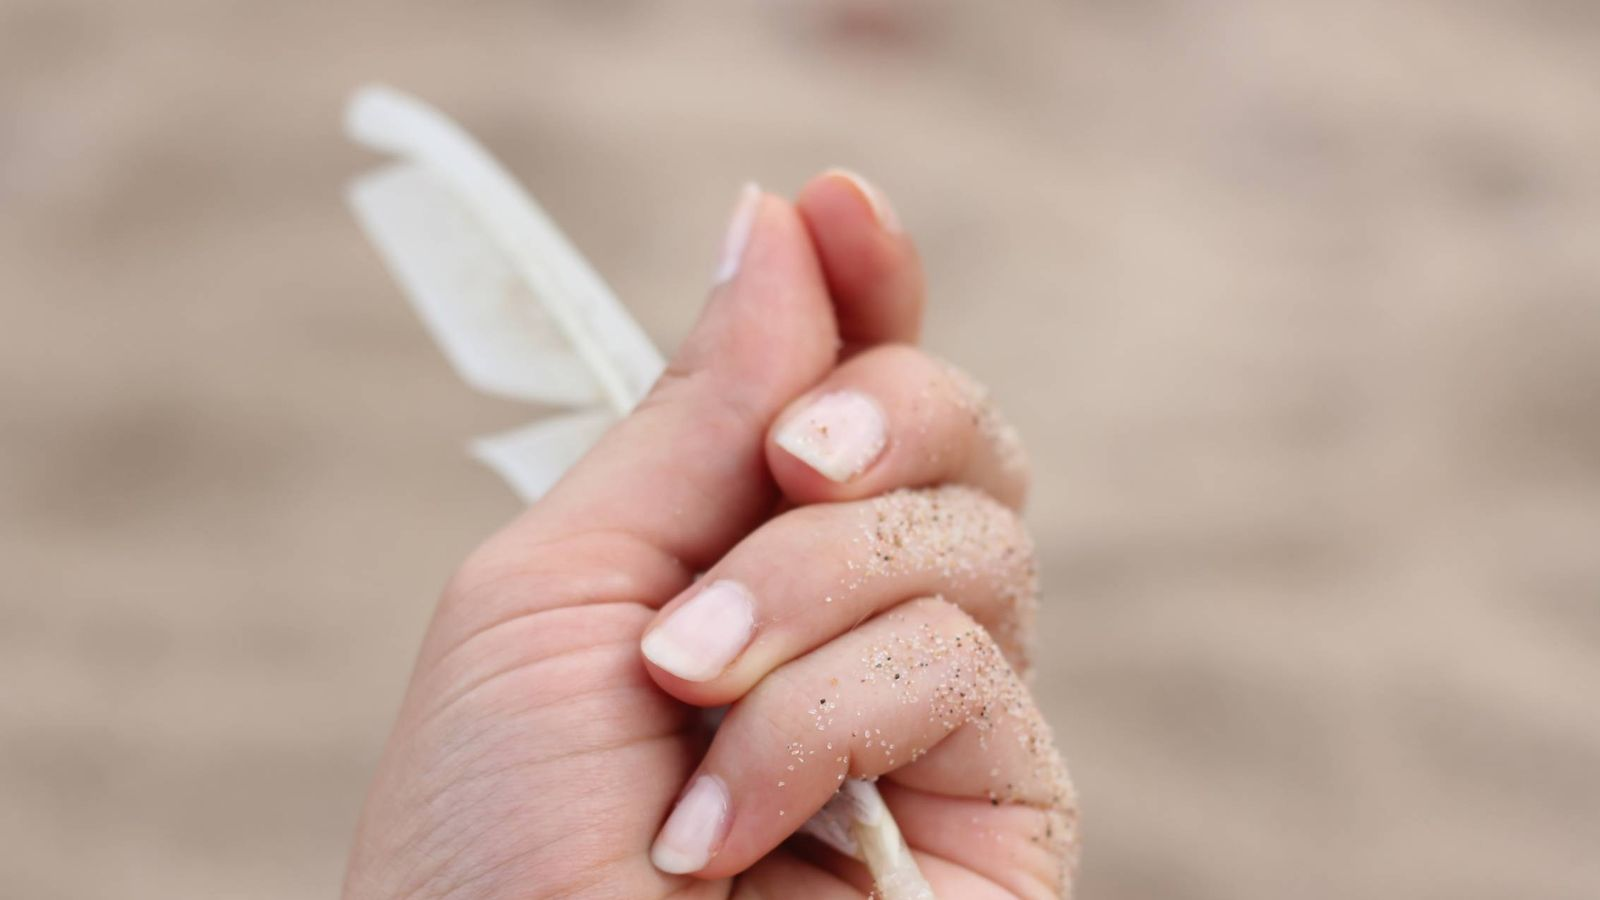 Foto: Consigue tu manicura soñada. (Mona Eendra para Unsplash)